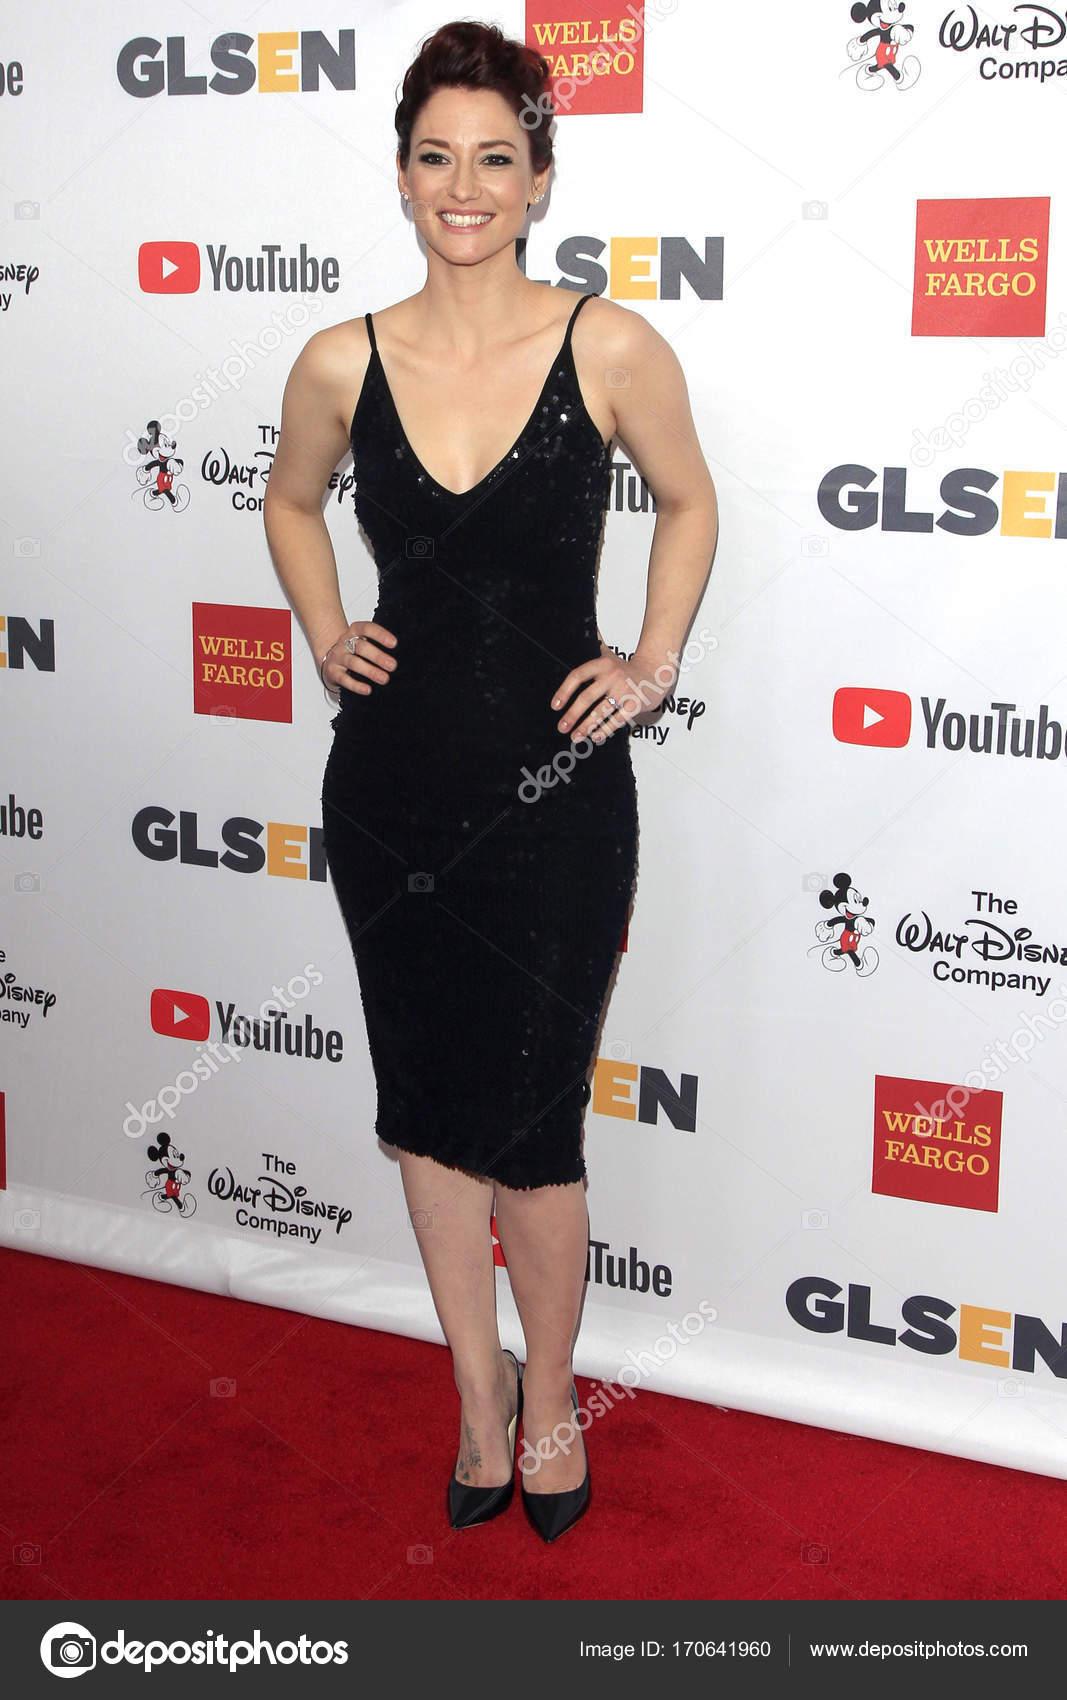 Delia Scala,Suangporn jaturaphut Porn pics & movies Jennifer Lafleur,Tiffany Grant